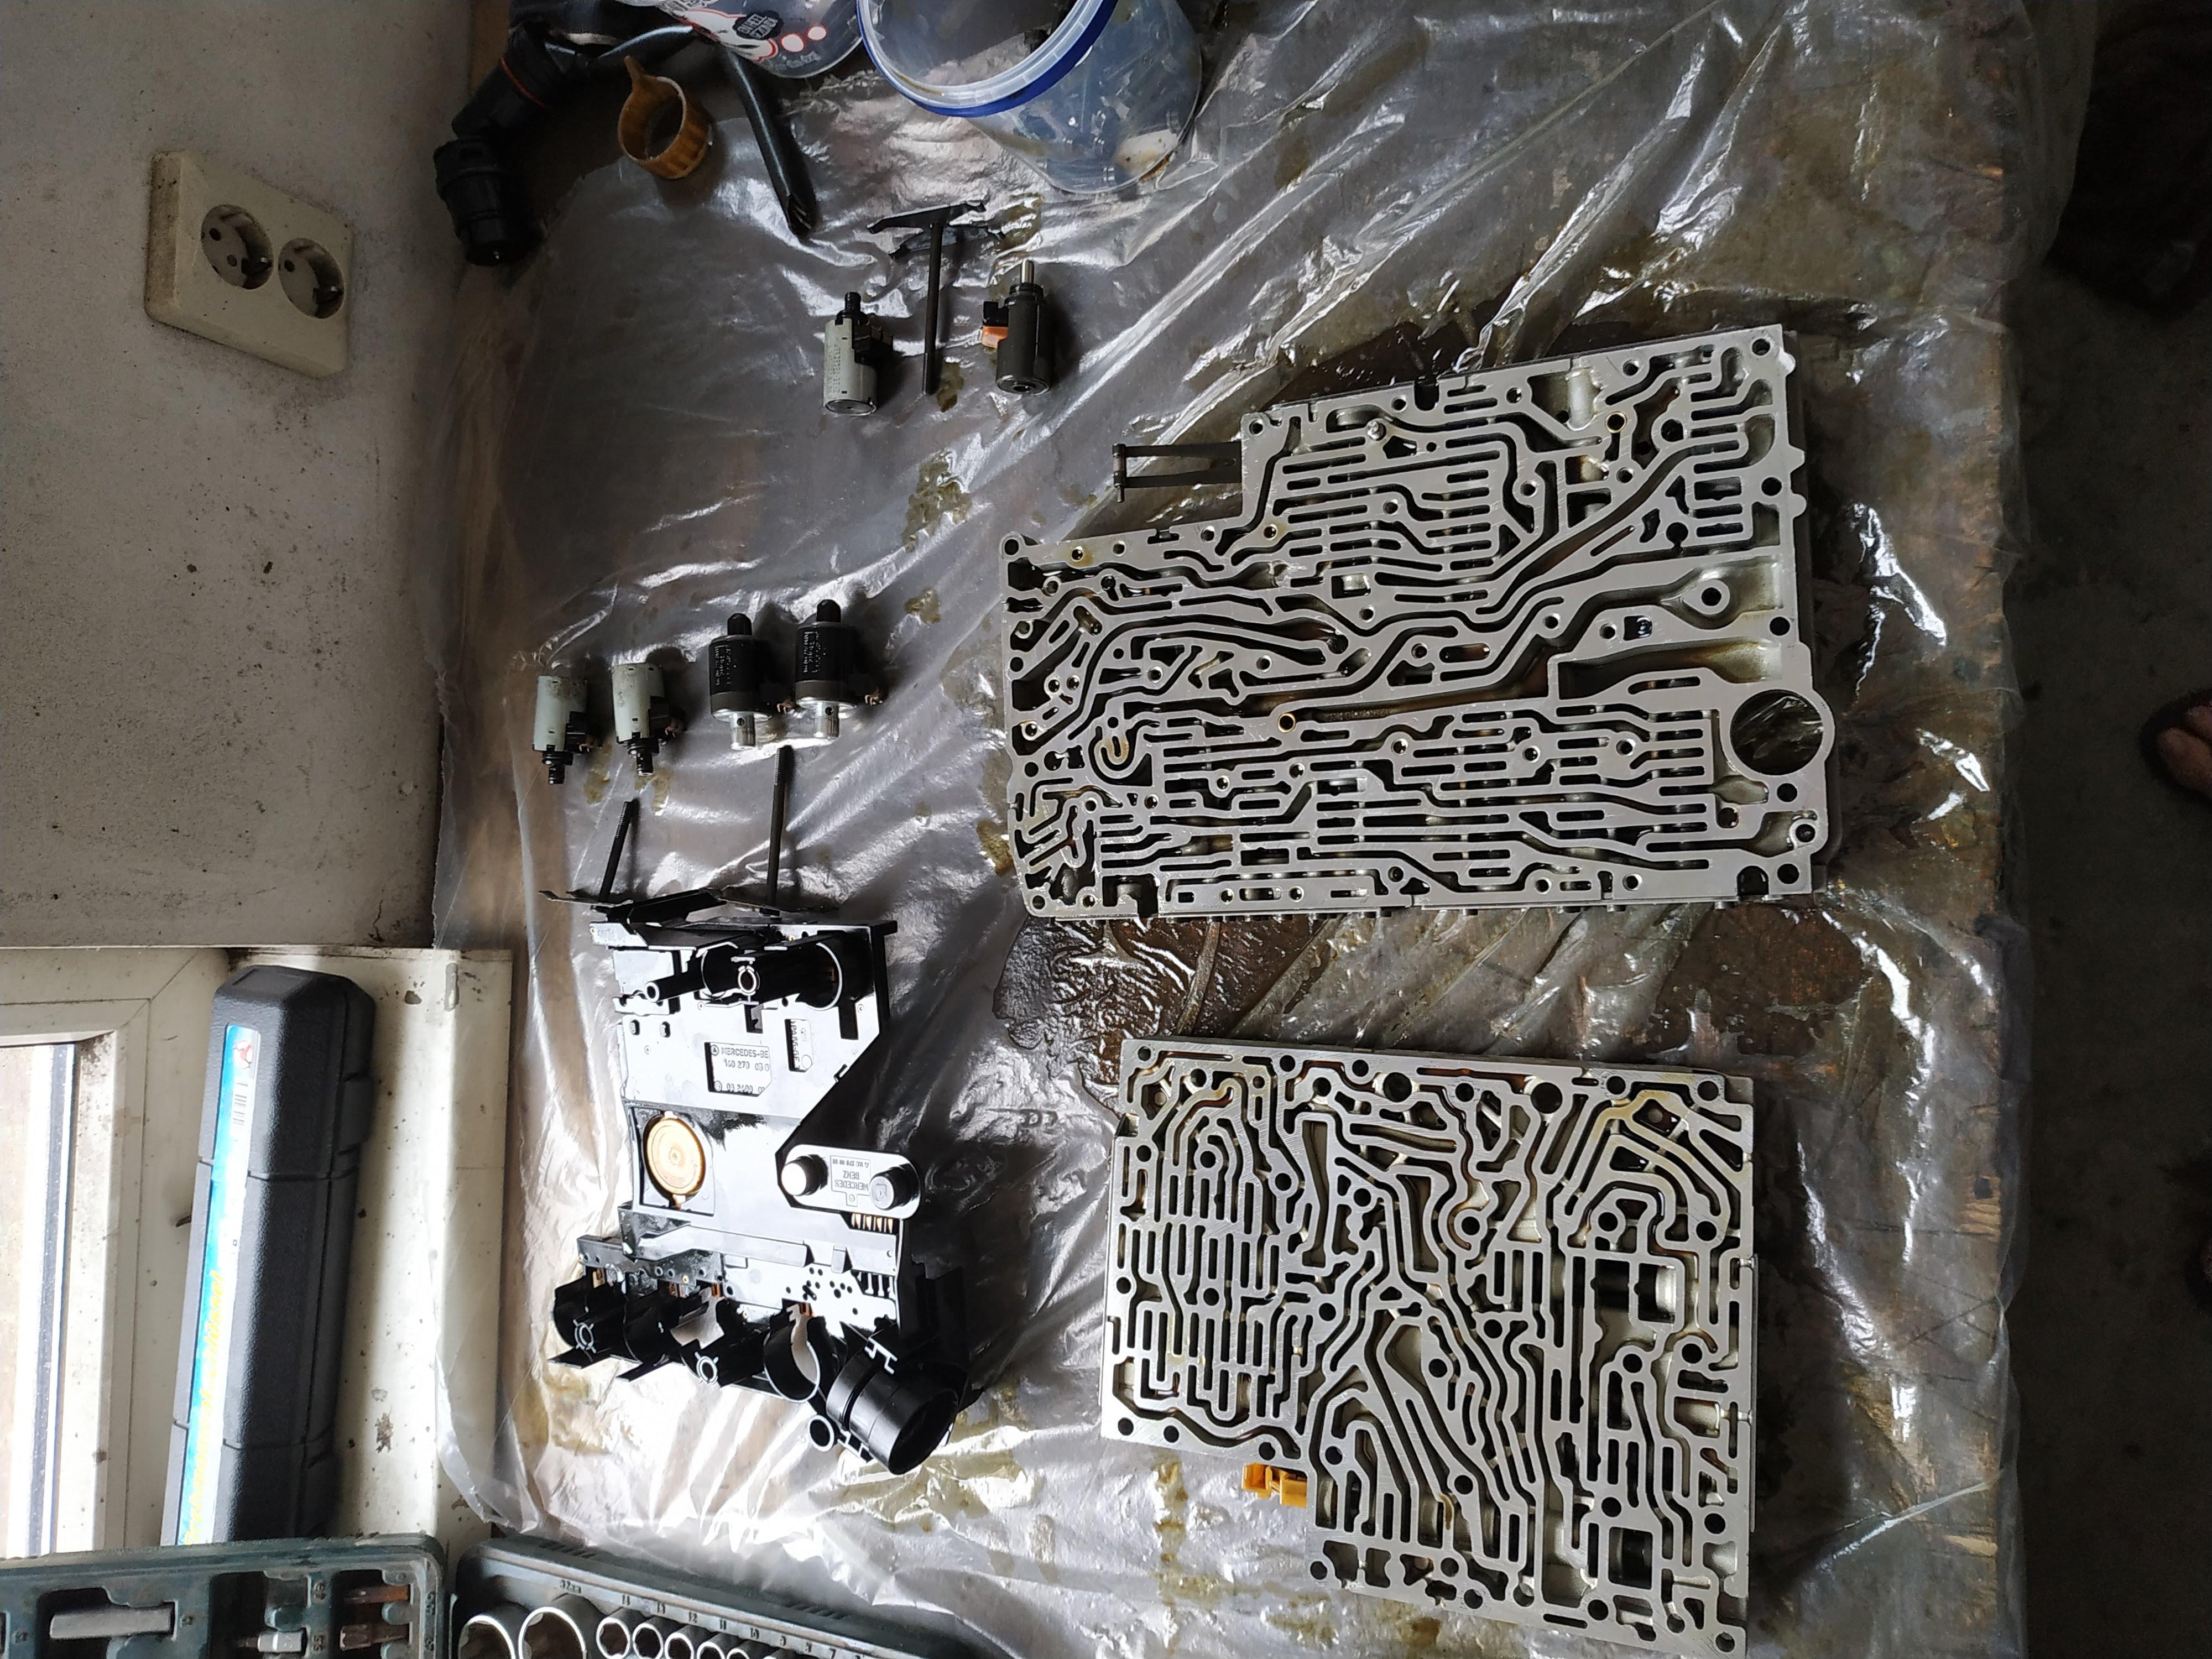 722 6 valve body inspections and leak repairs - JMSpeedshop !